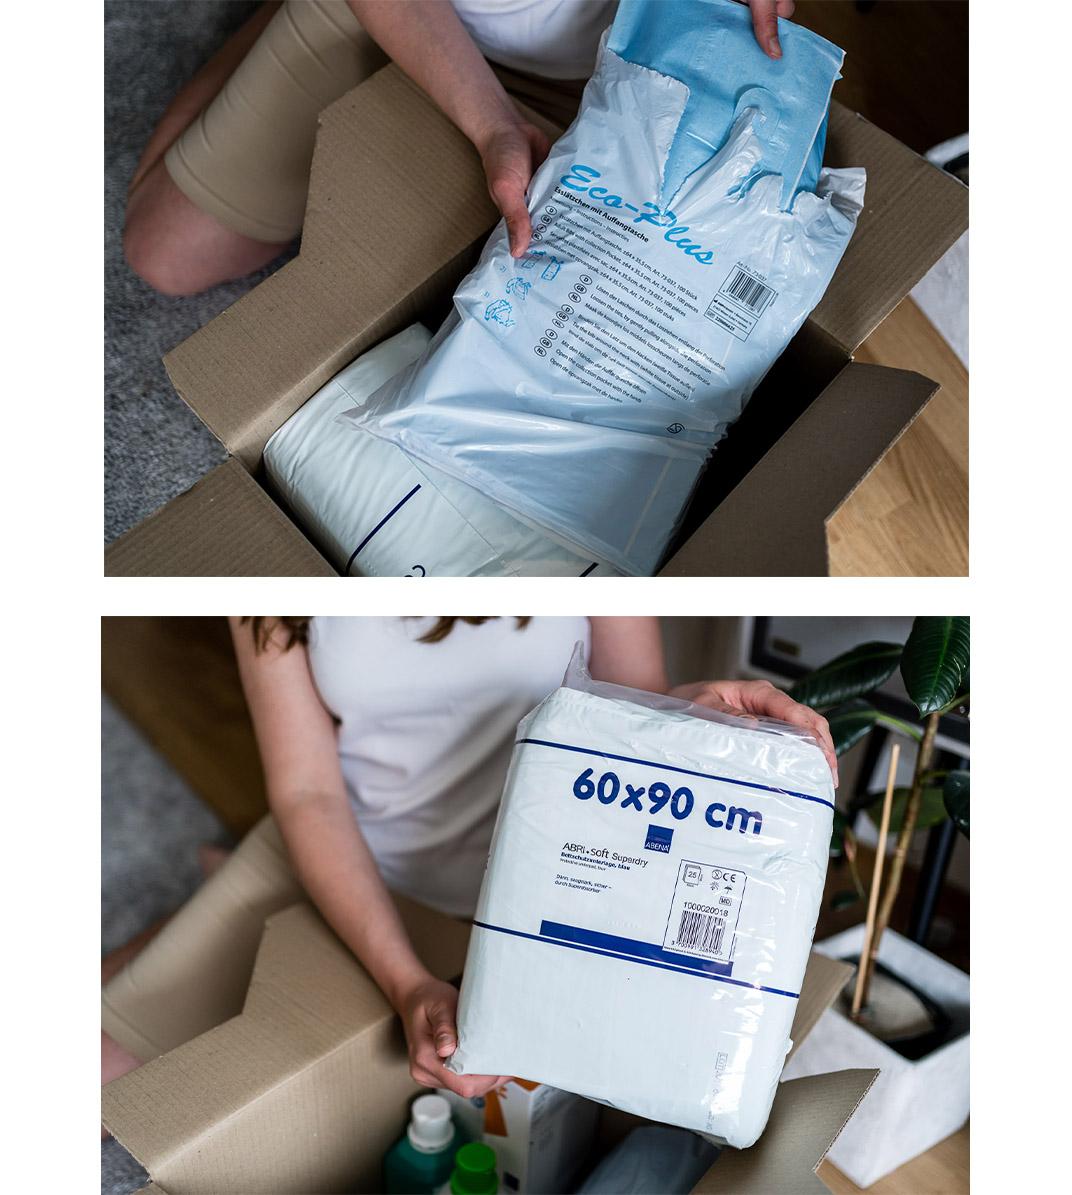 PflegeBox von proSenio